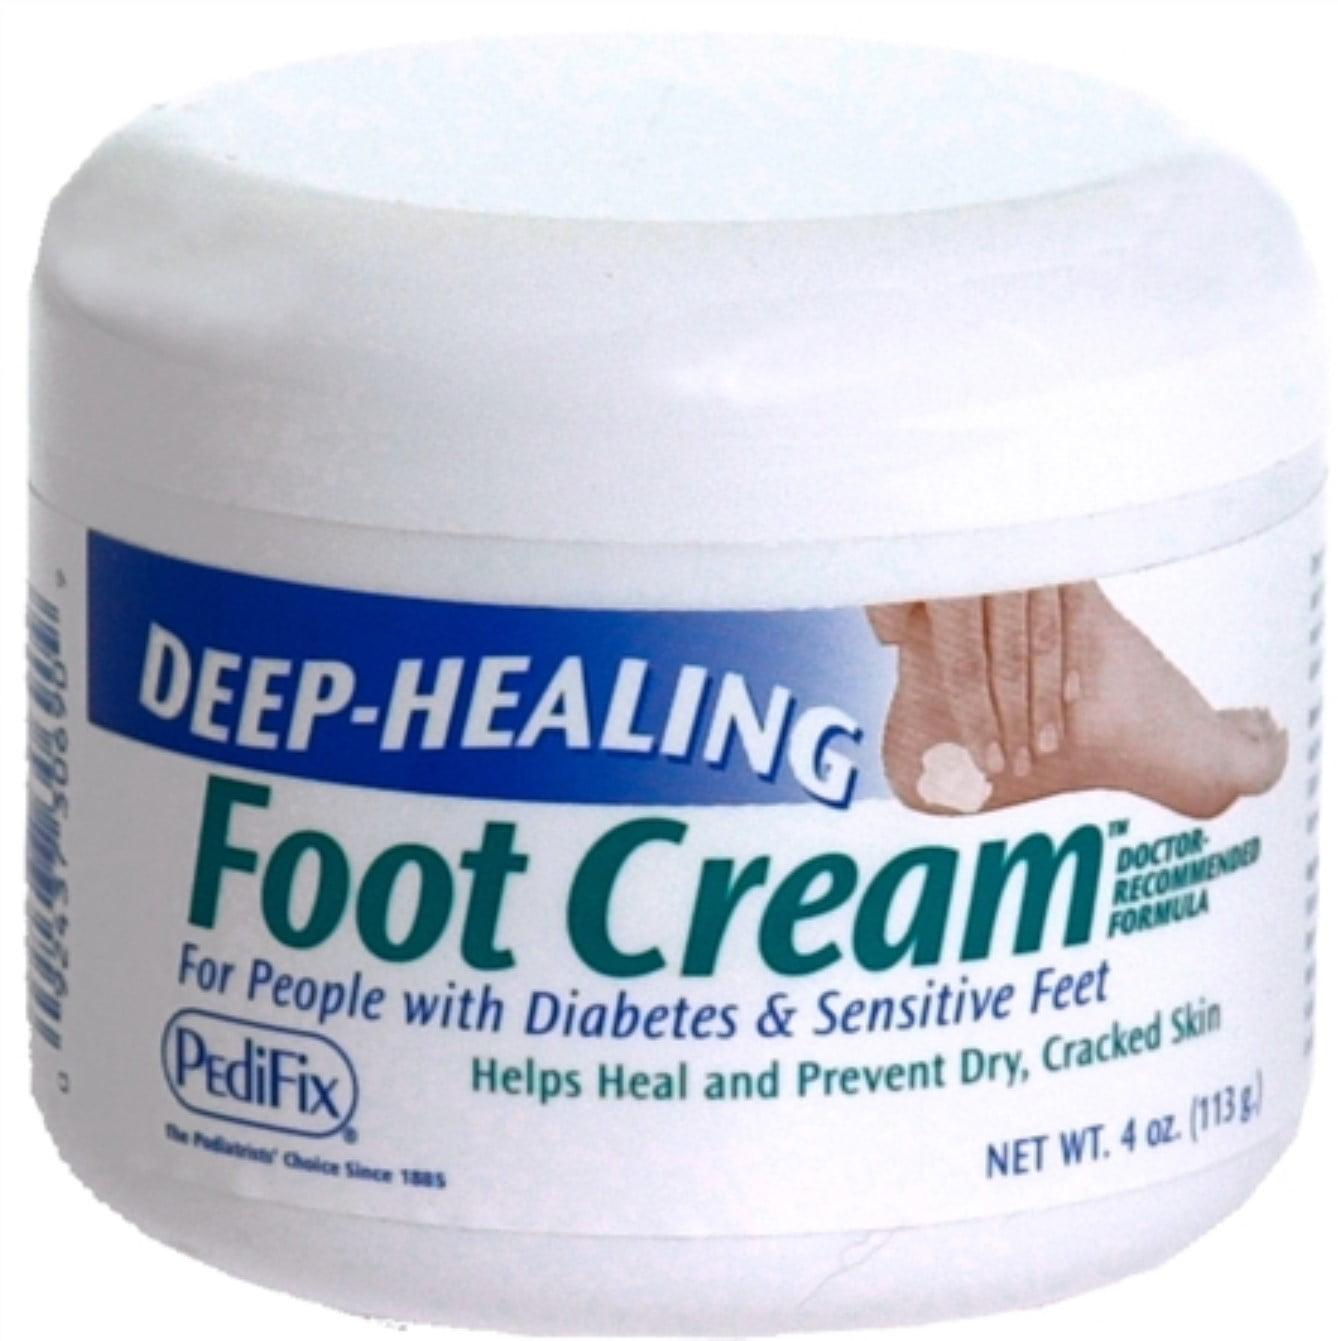 PediFix Deep-Healing Foot Cream 4 oz